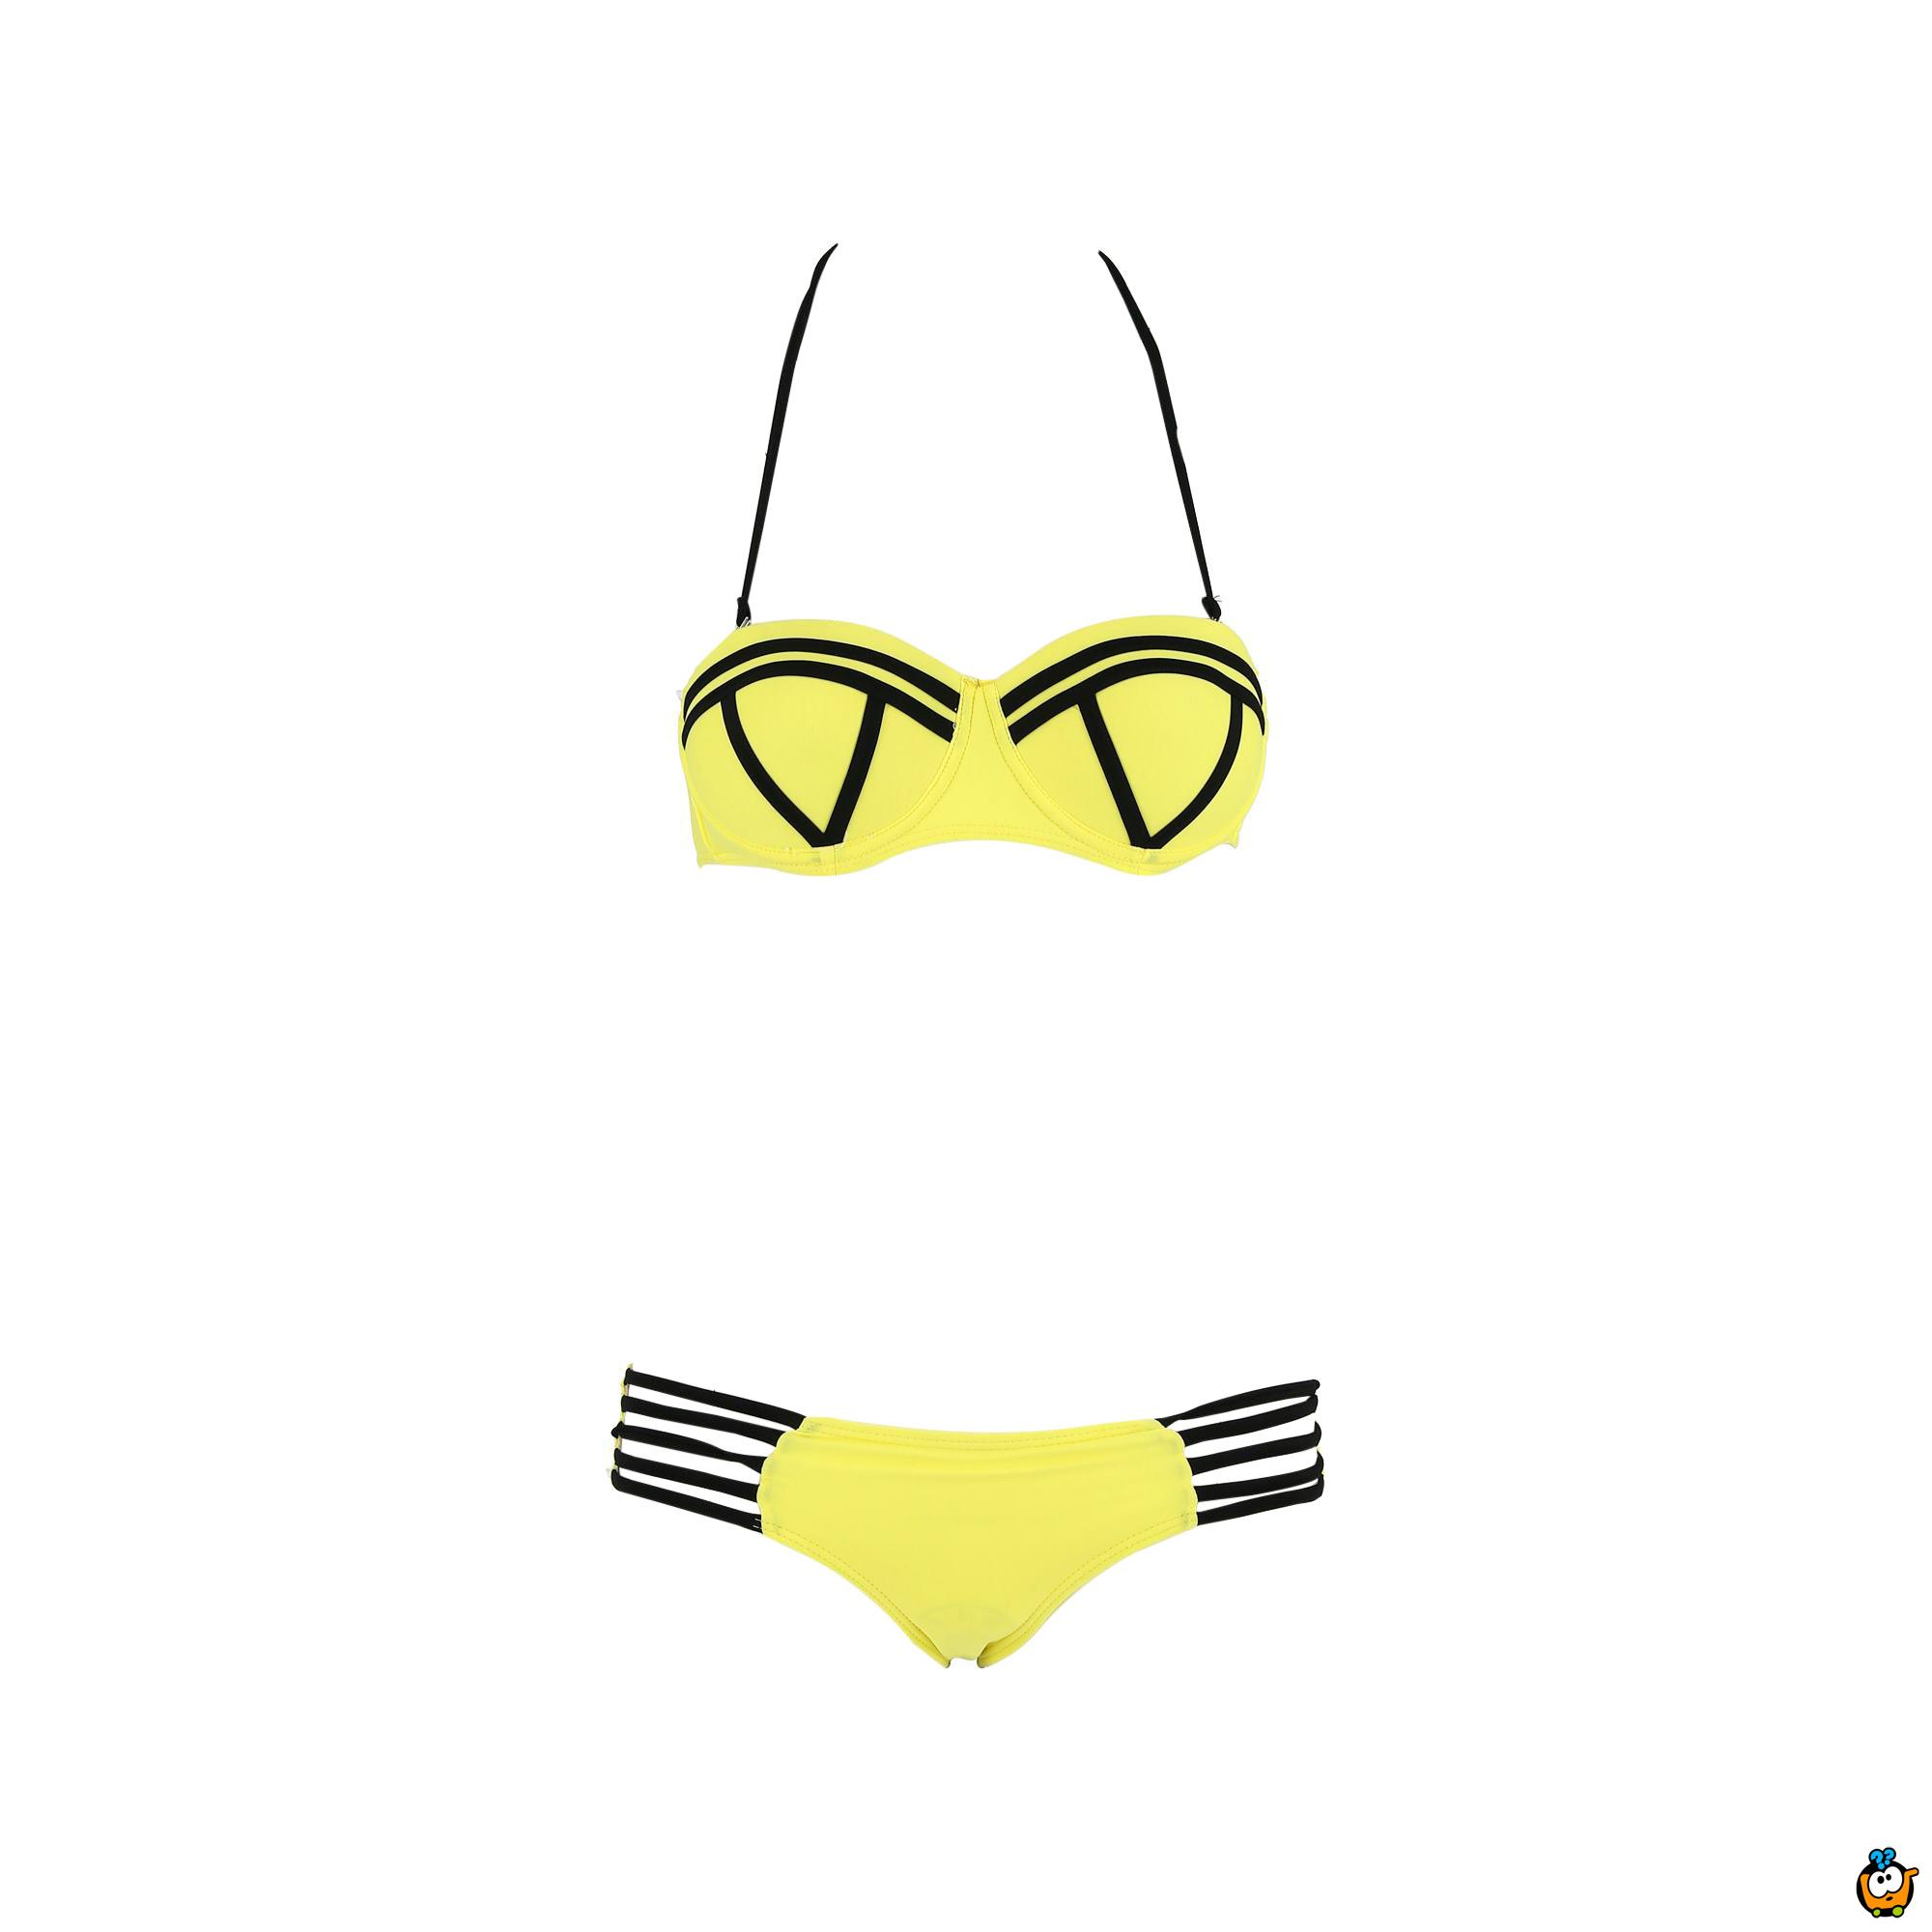 Dvodelni ženski kupaći kostim - SUPER GIRL YELLOW